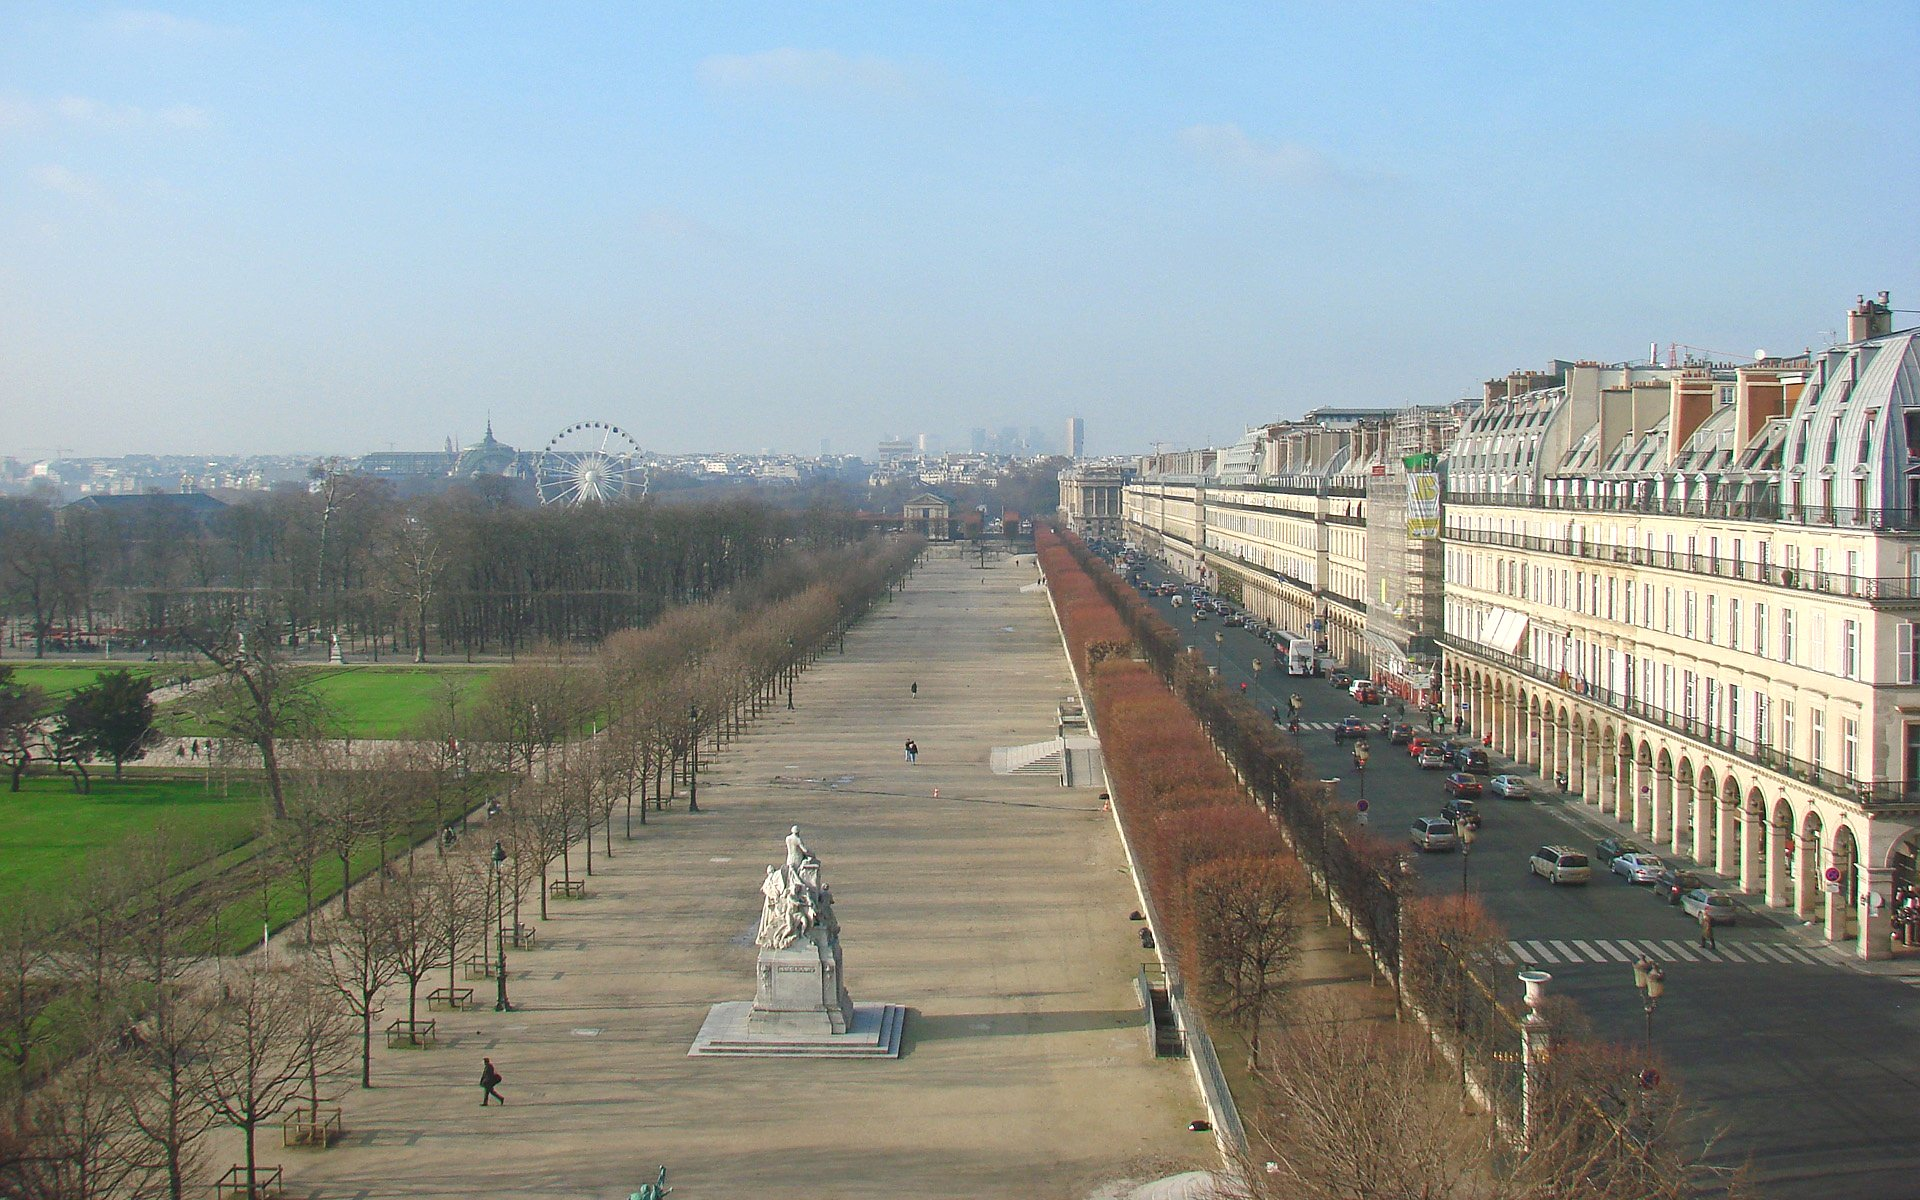 Le_Jardin_des_Tuileries_et_la_Rue_de_Rivoli_en_hiver_(3134279205).jpg